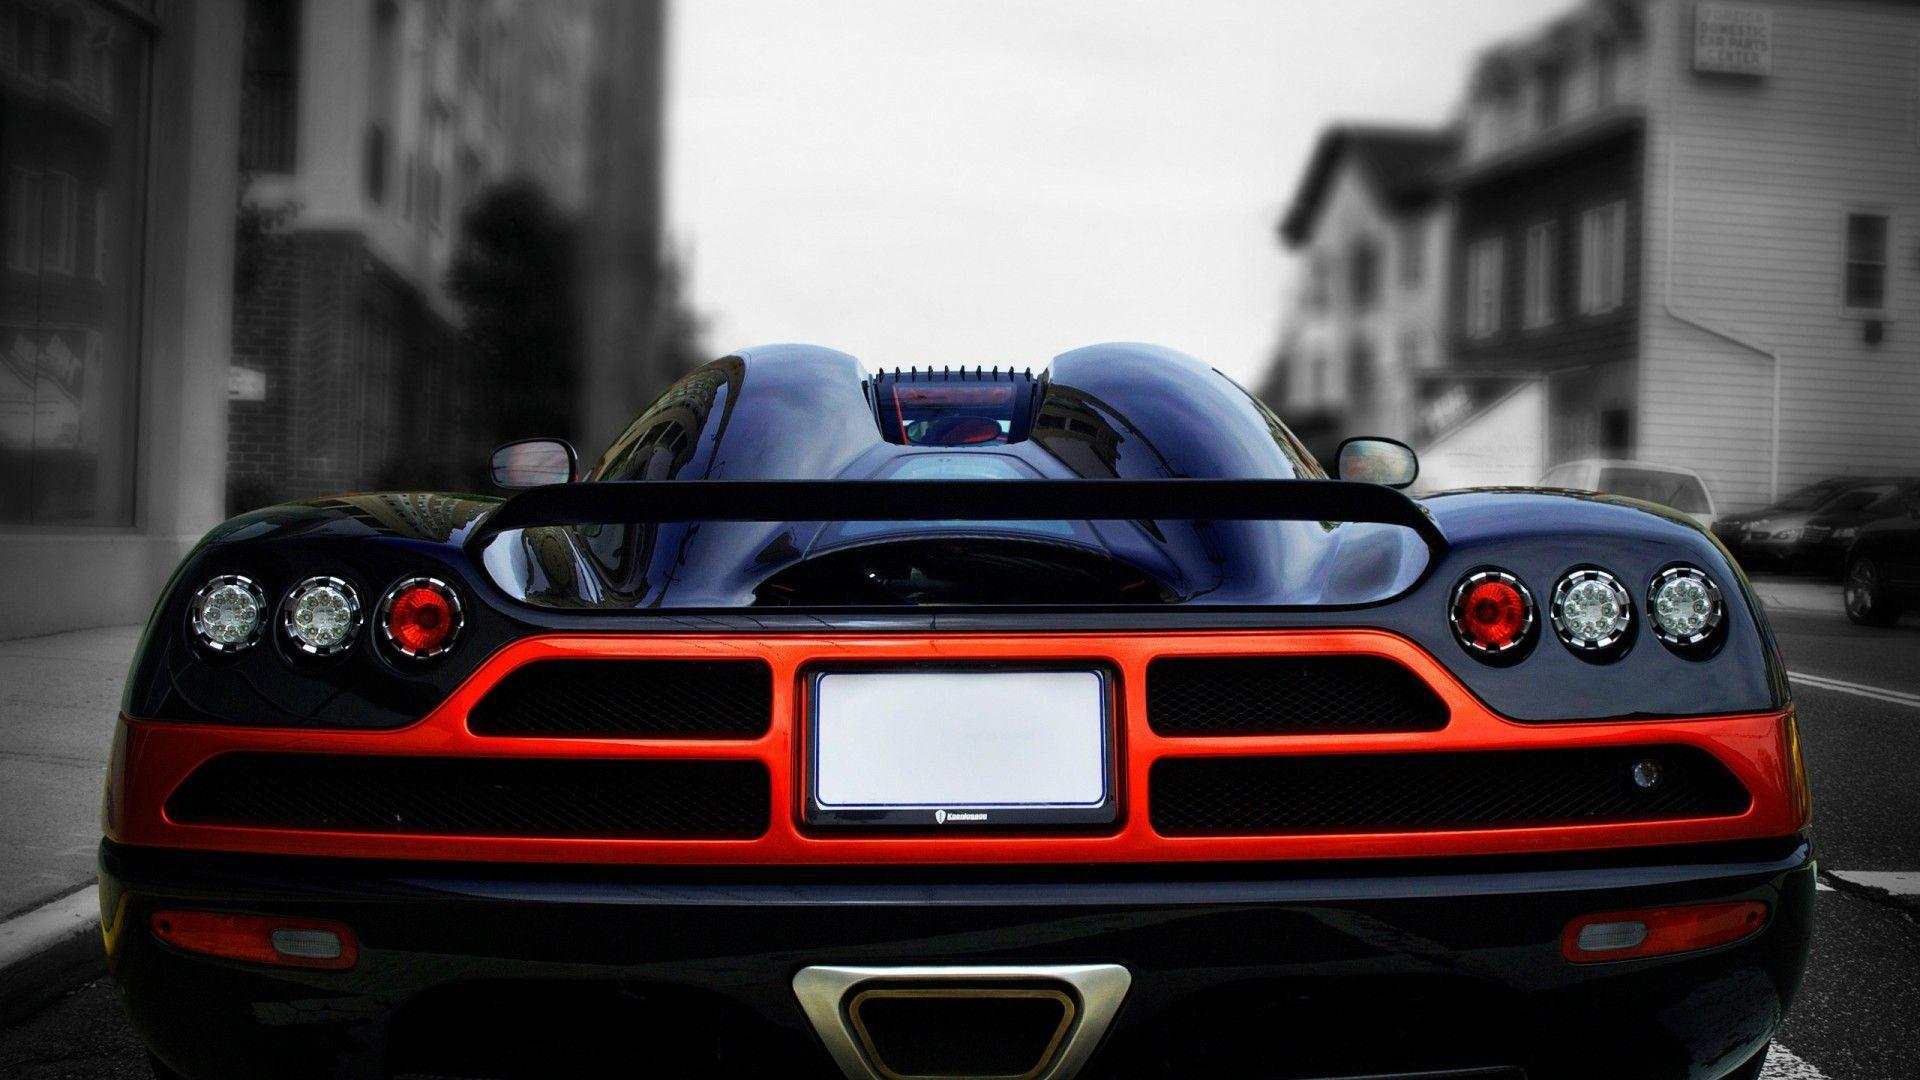 4K Ultra HD Car Wallpapers - Top Free 4K Ultra HD Car ...